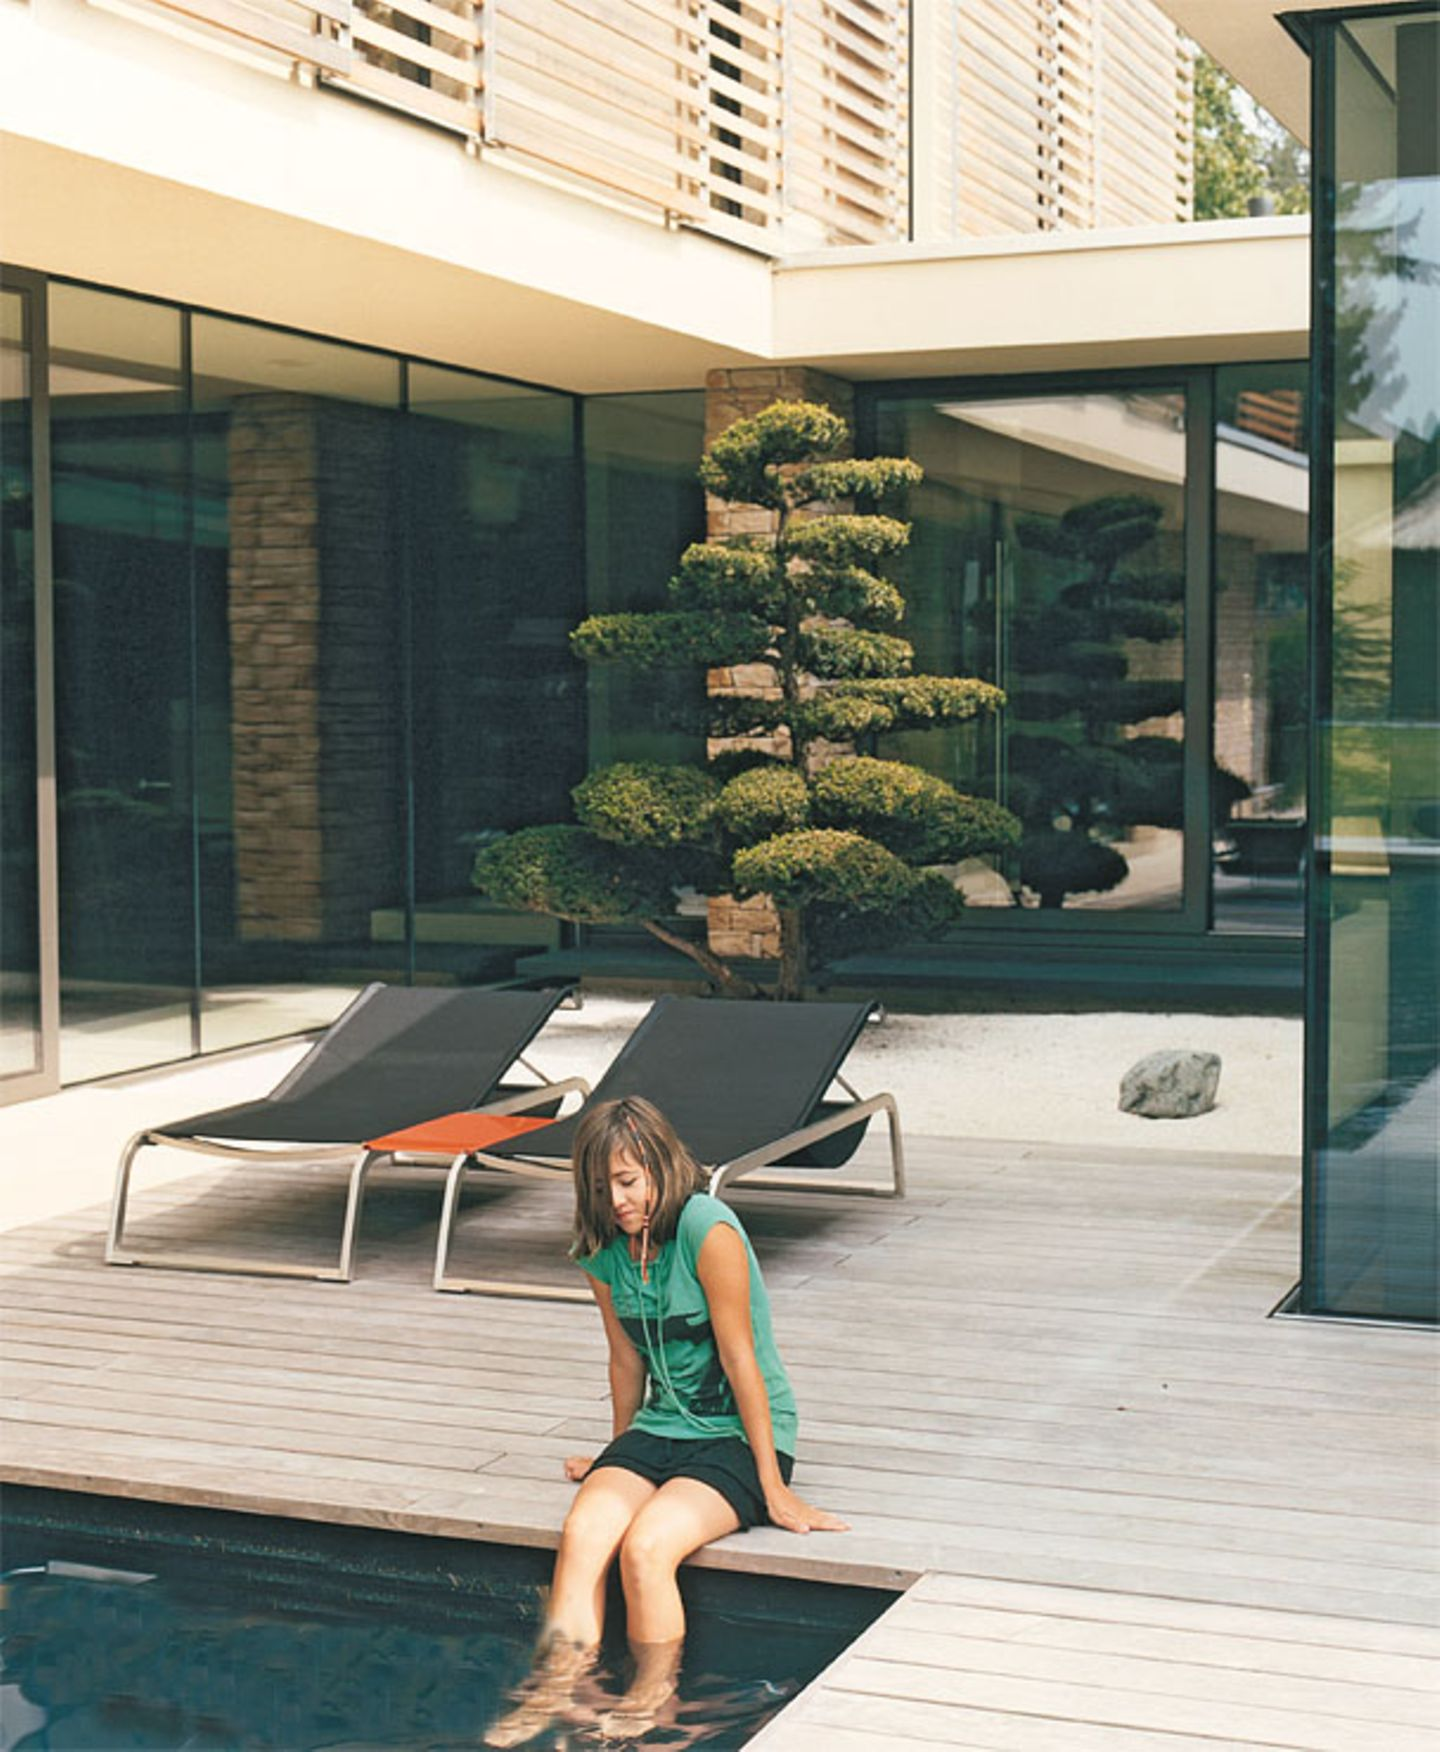 Terrasse aus hellem Holz